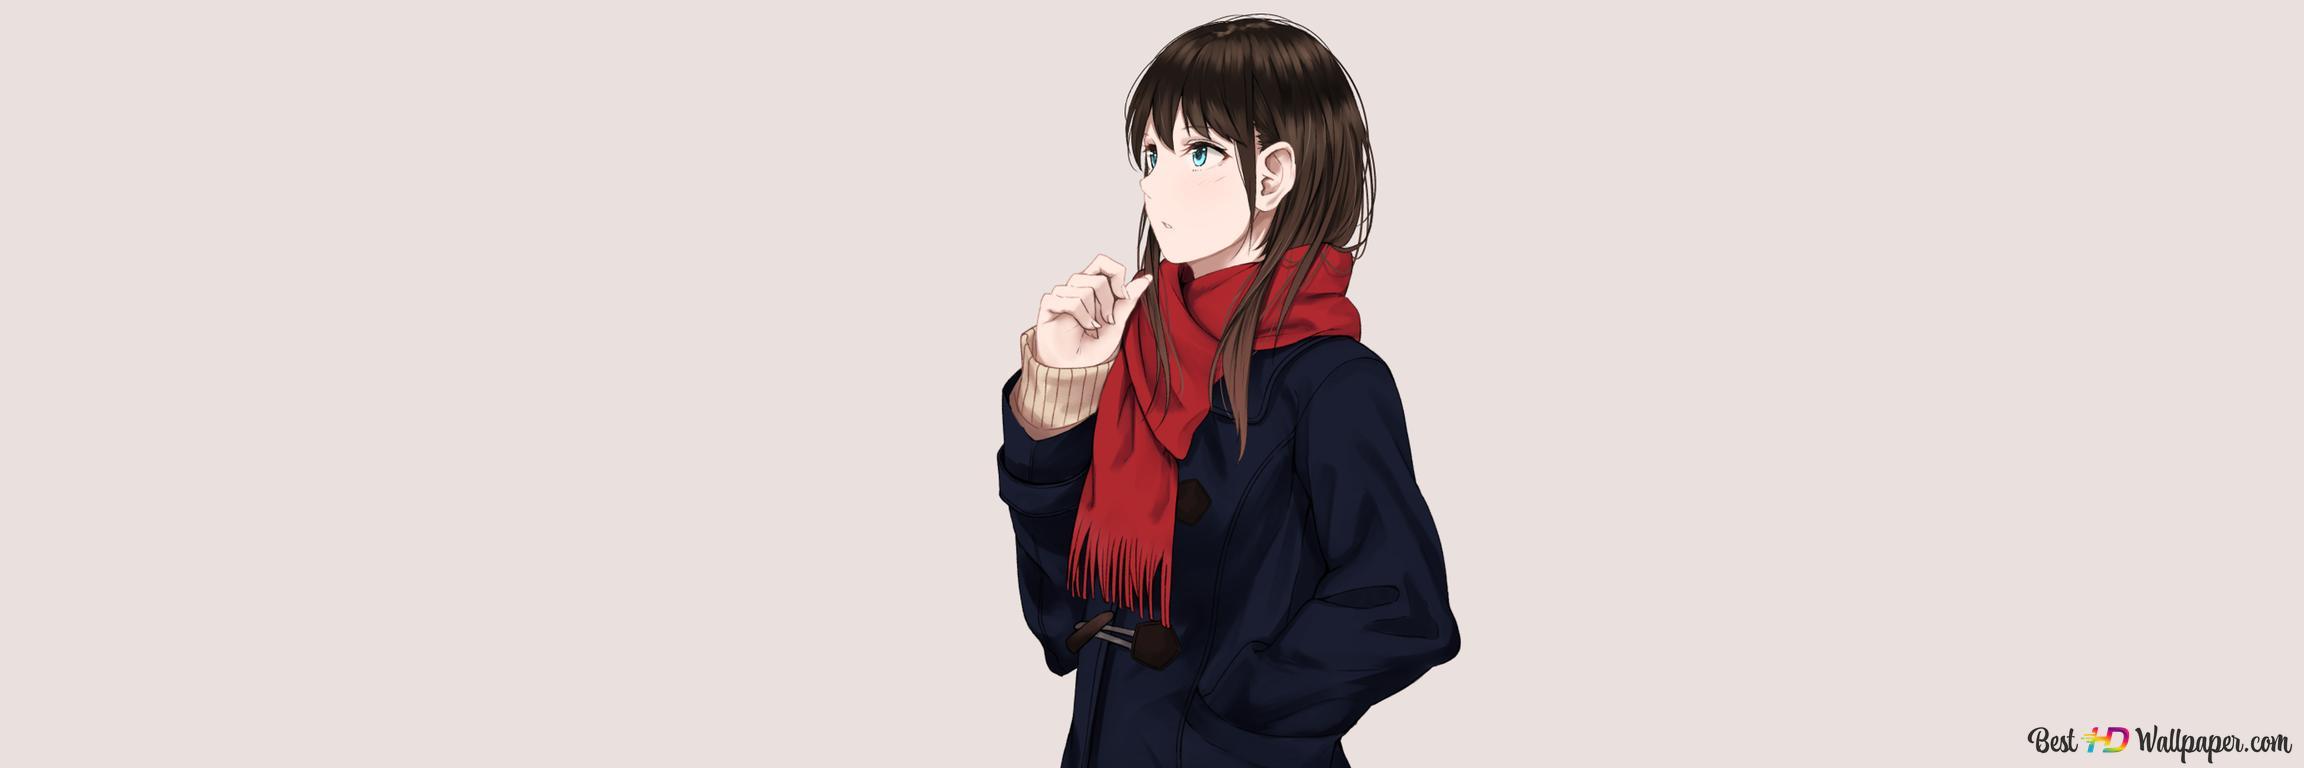 Black Hair Blue Eyes Anime Girl Hd Wallpaper Download